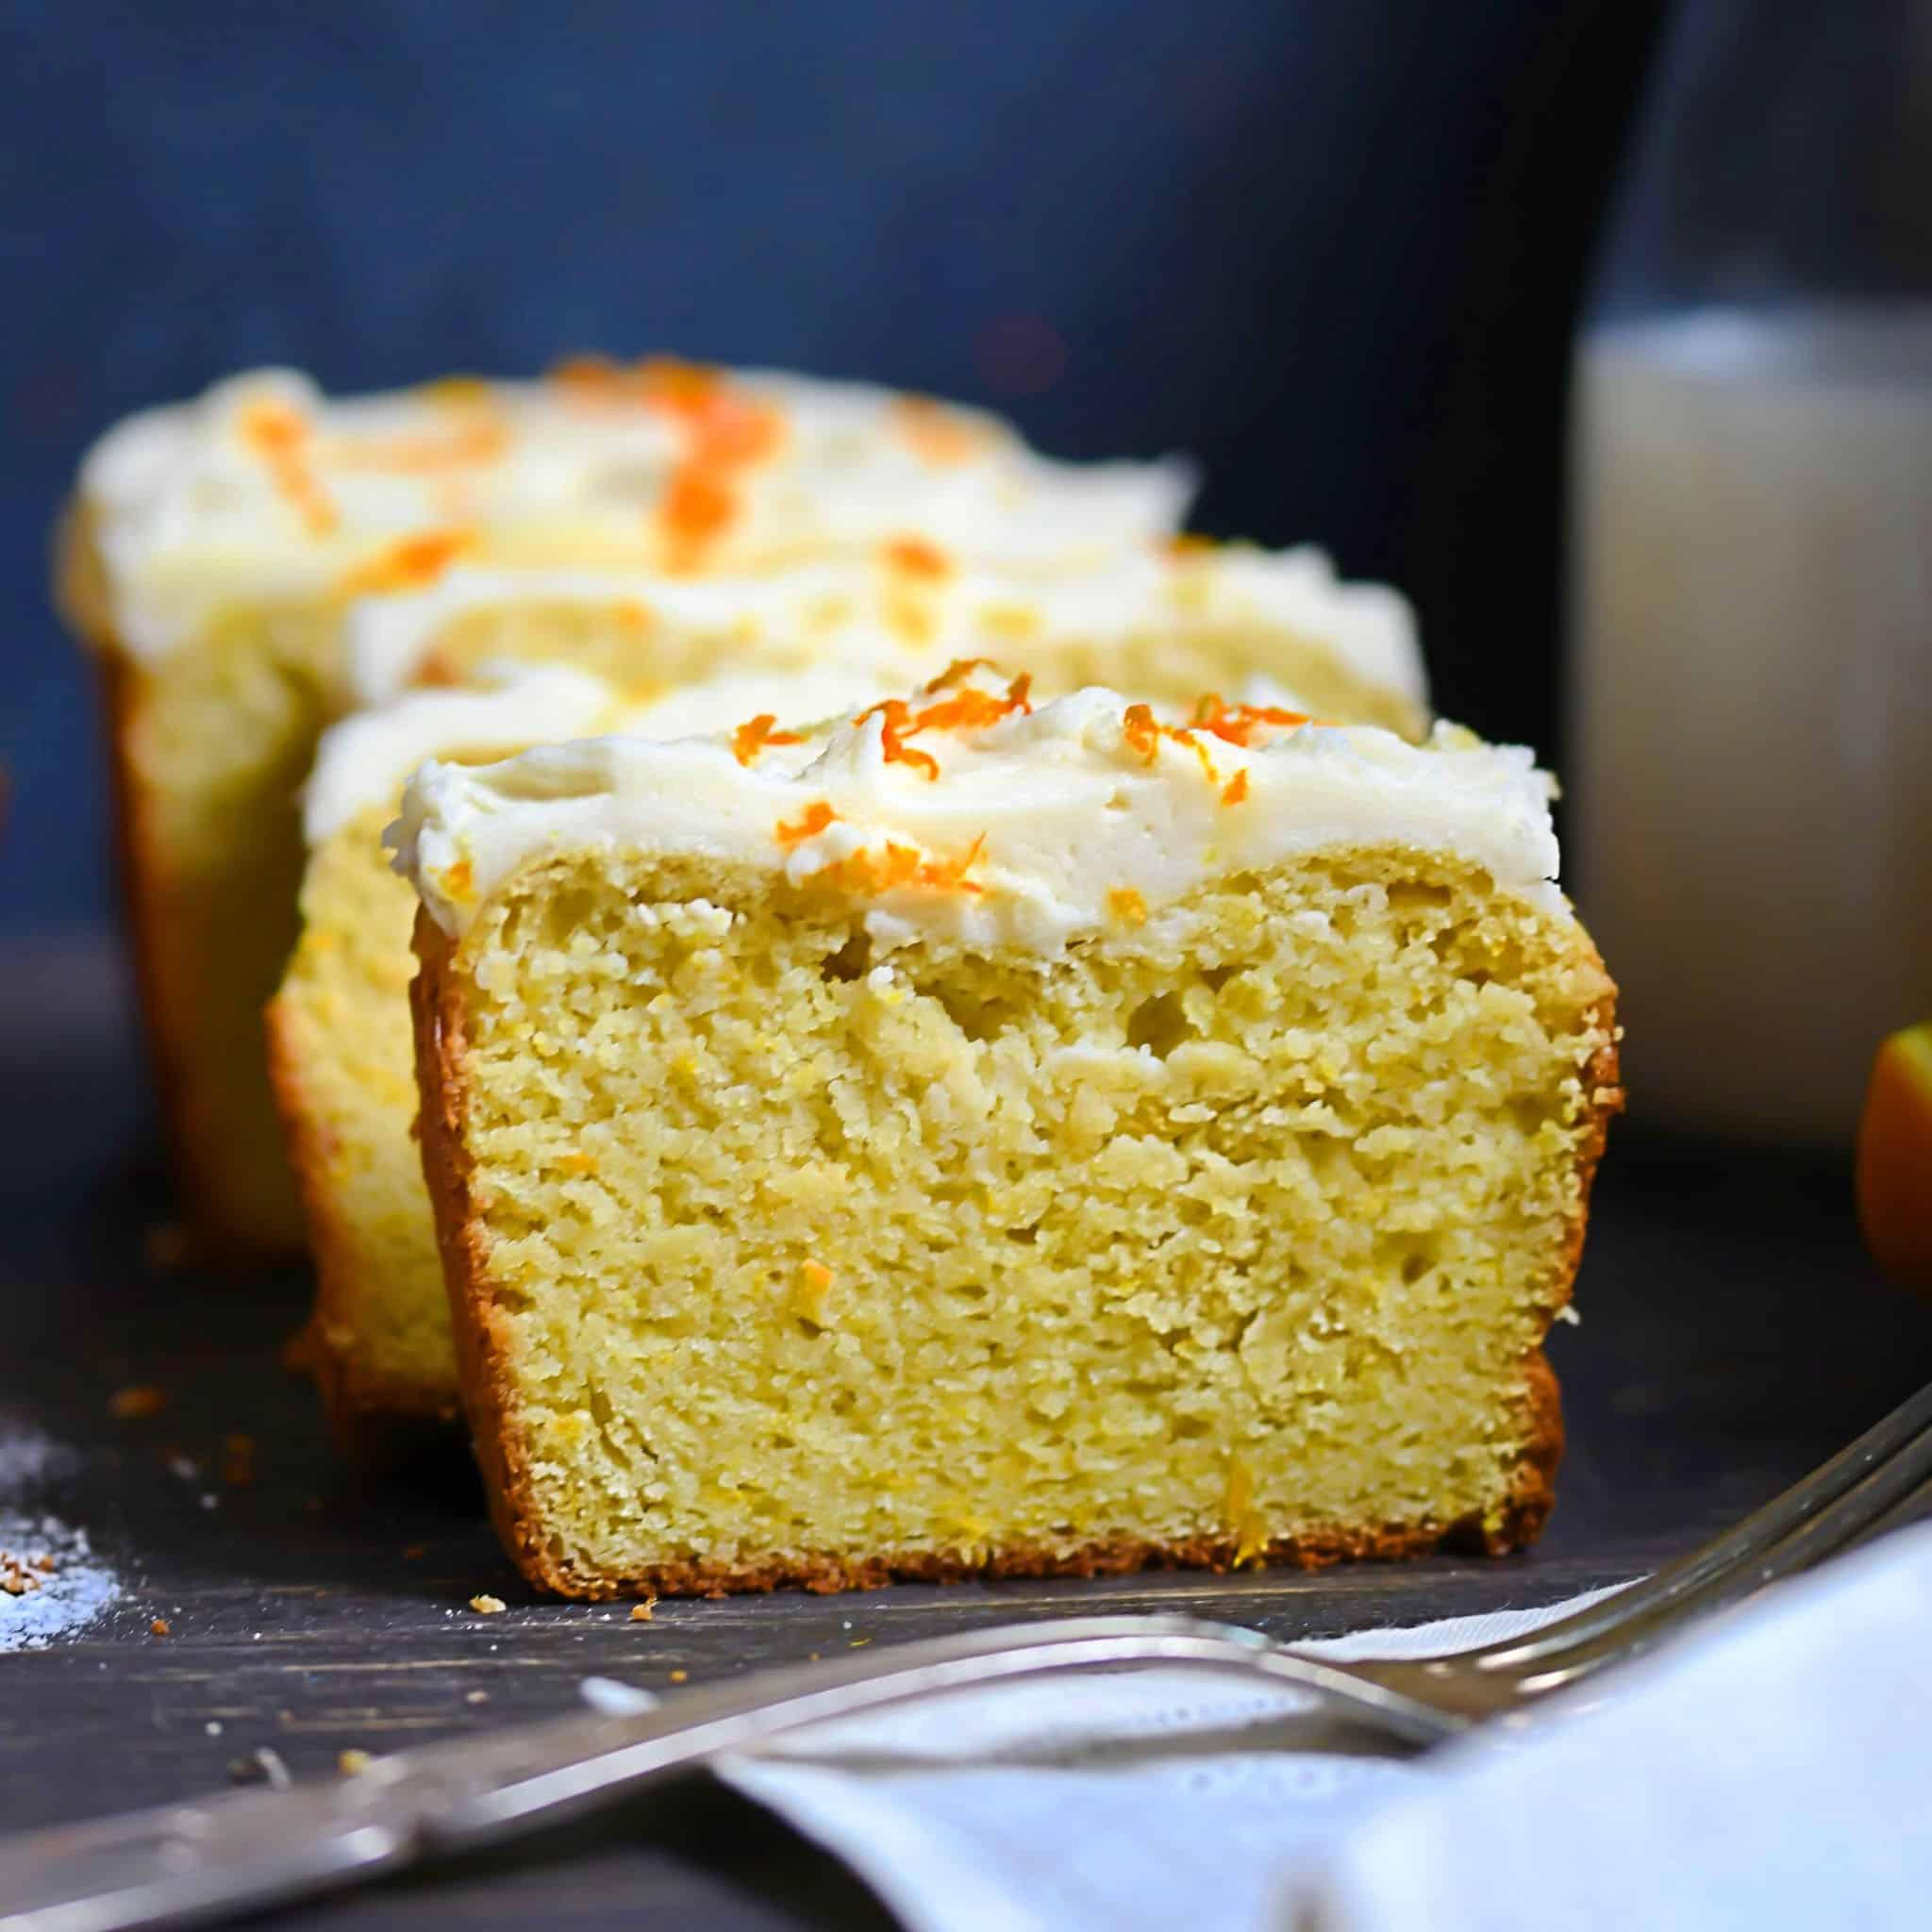 Low-Carb, Gluten-Free Orange Loaf